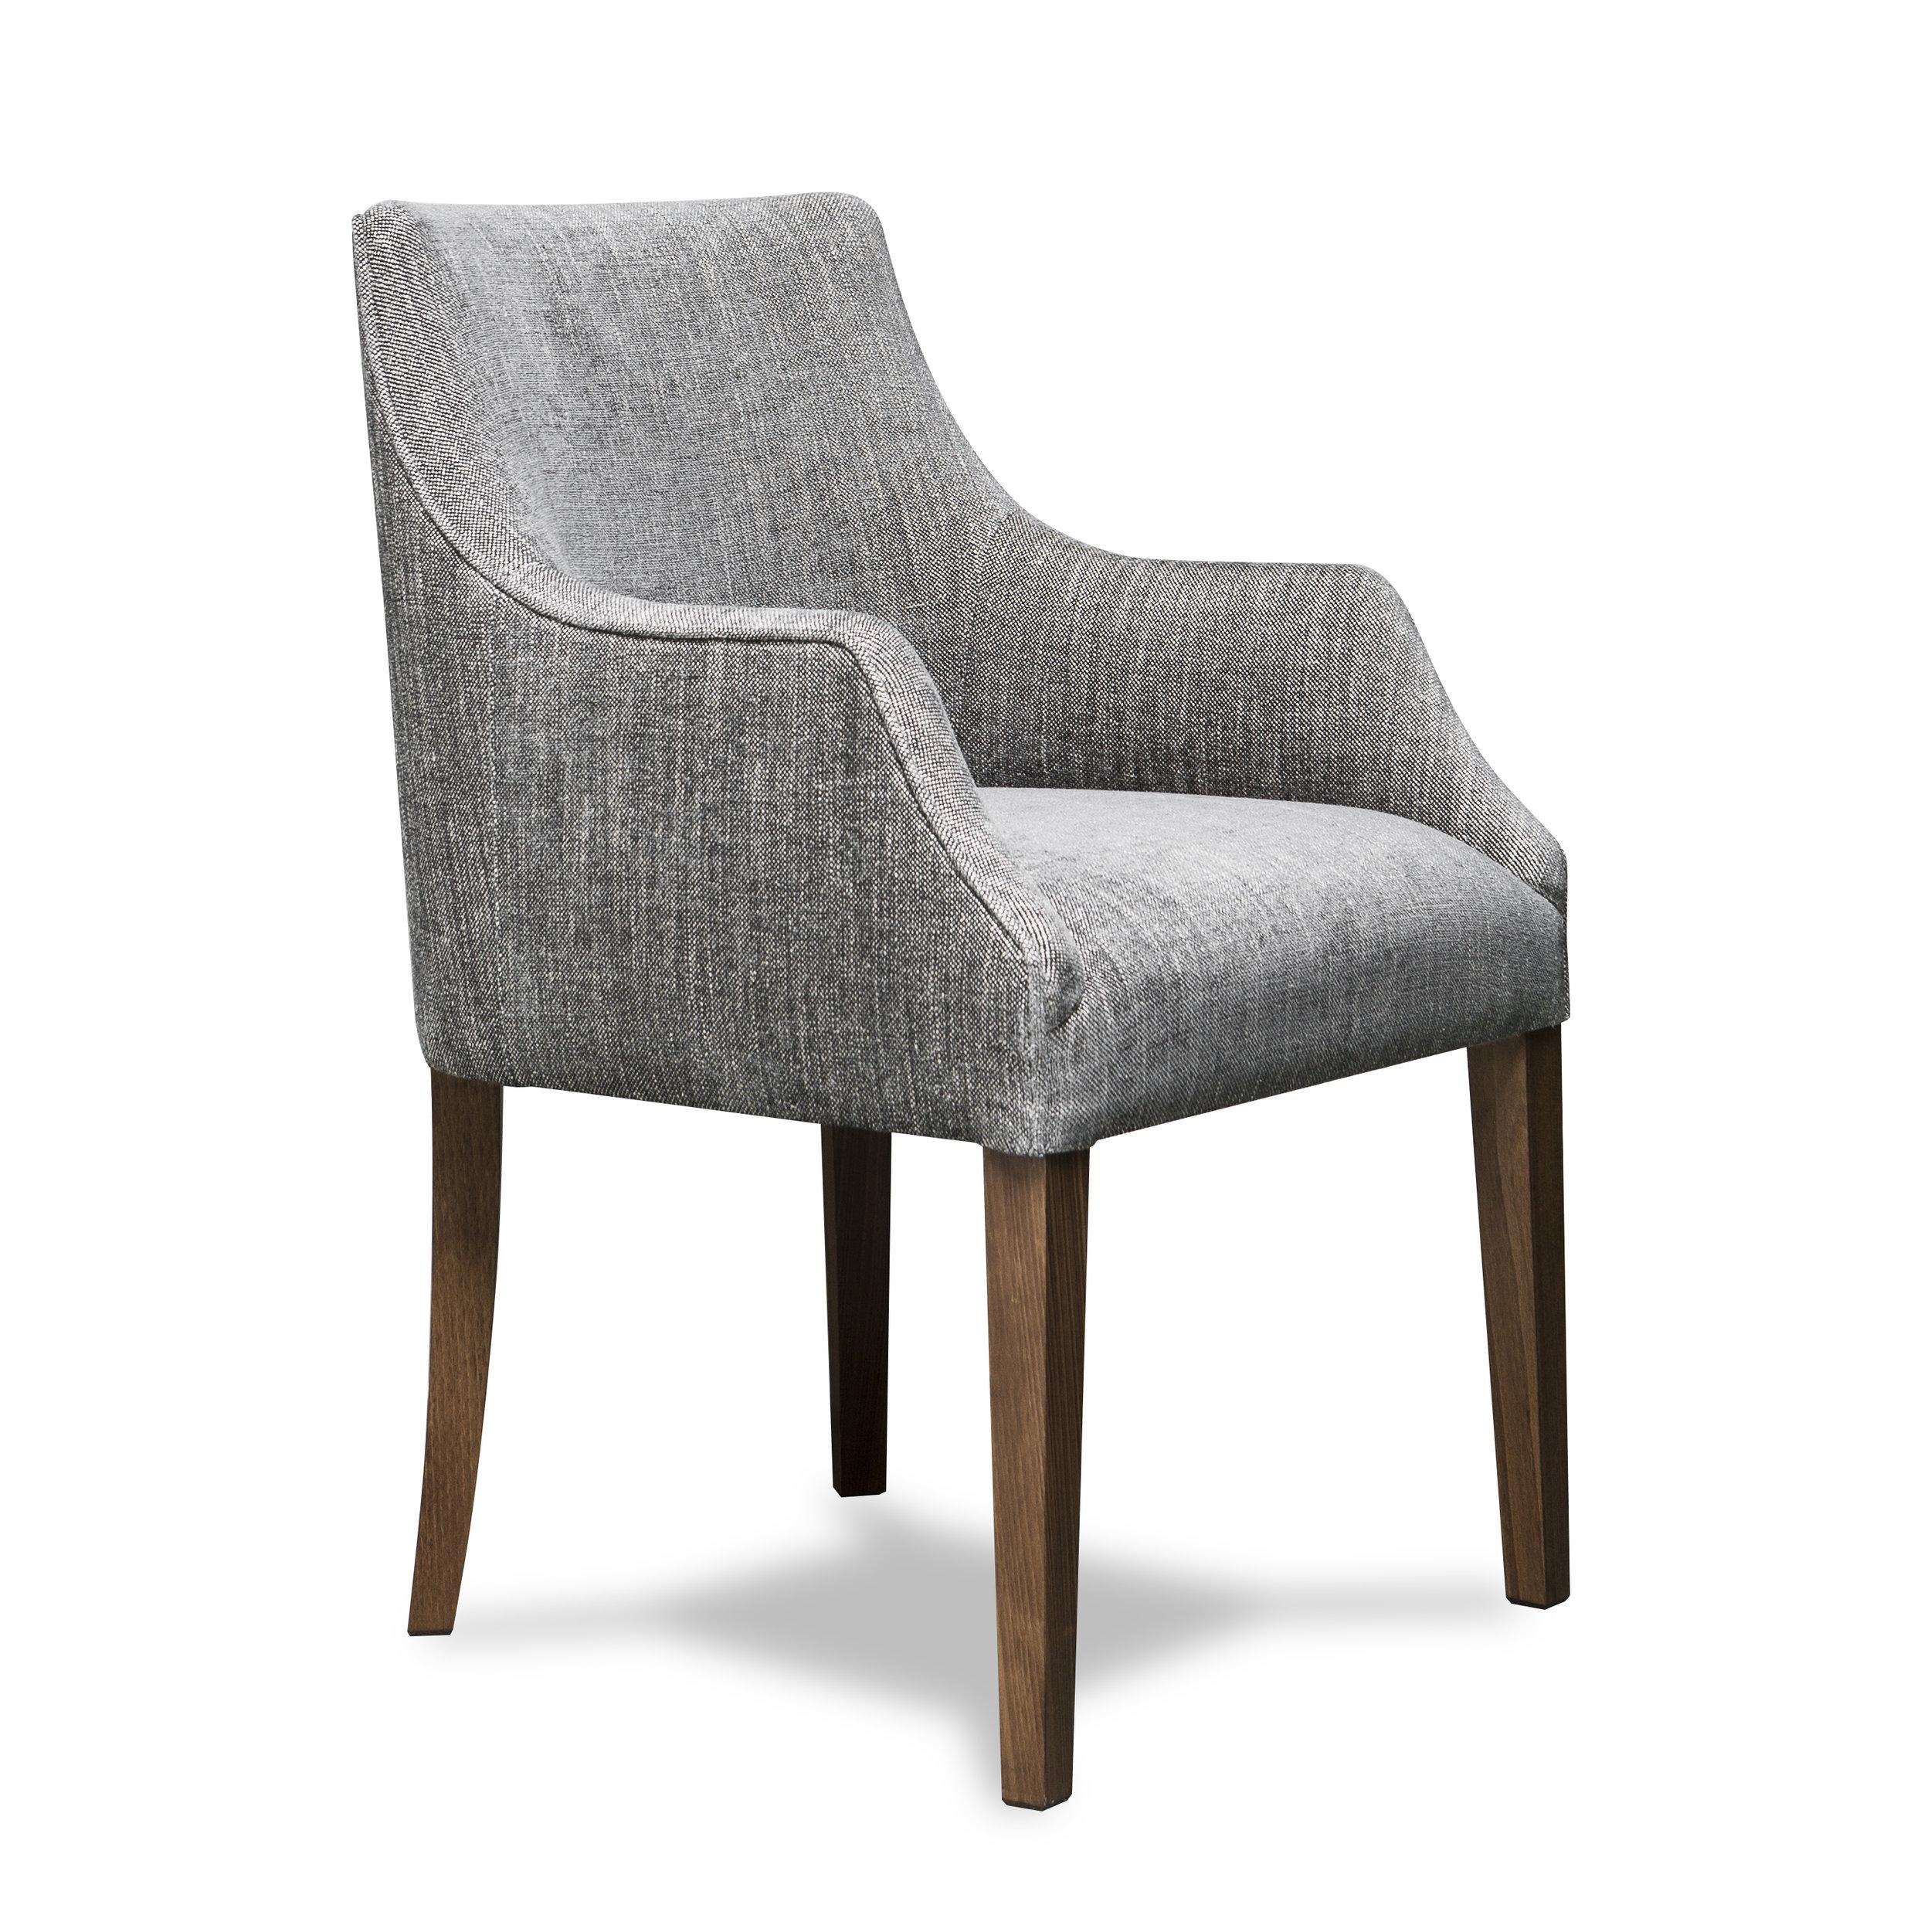 maries-corner-chair-denver-f.jpg